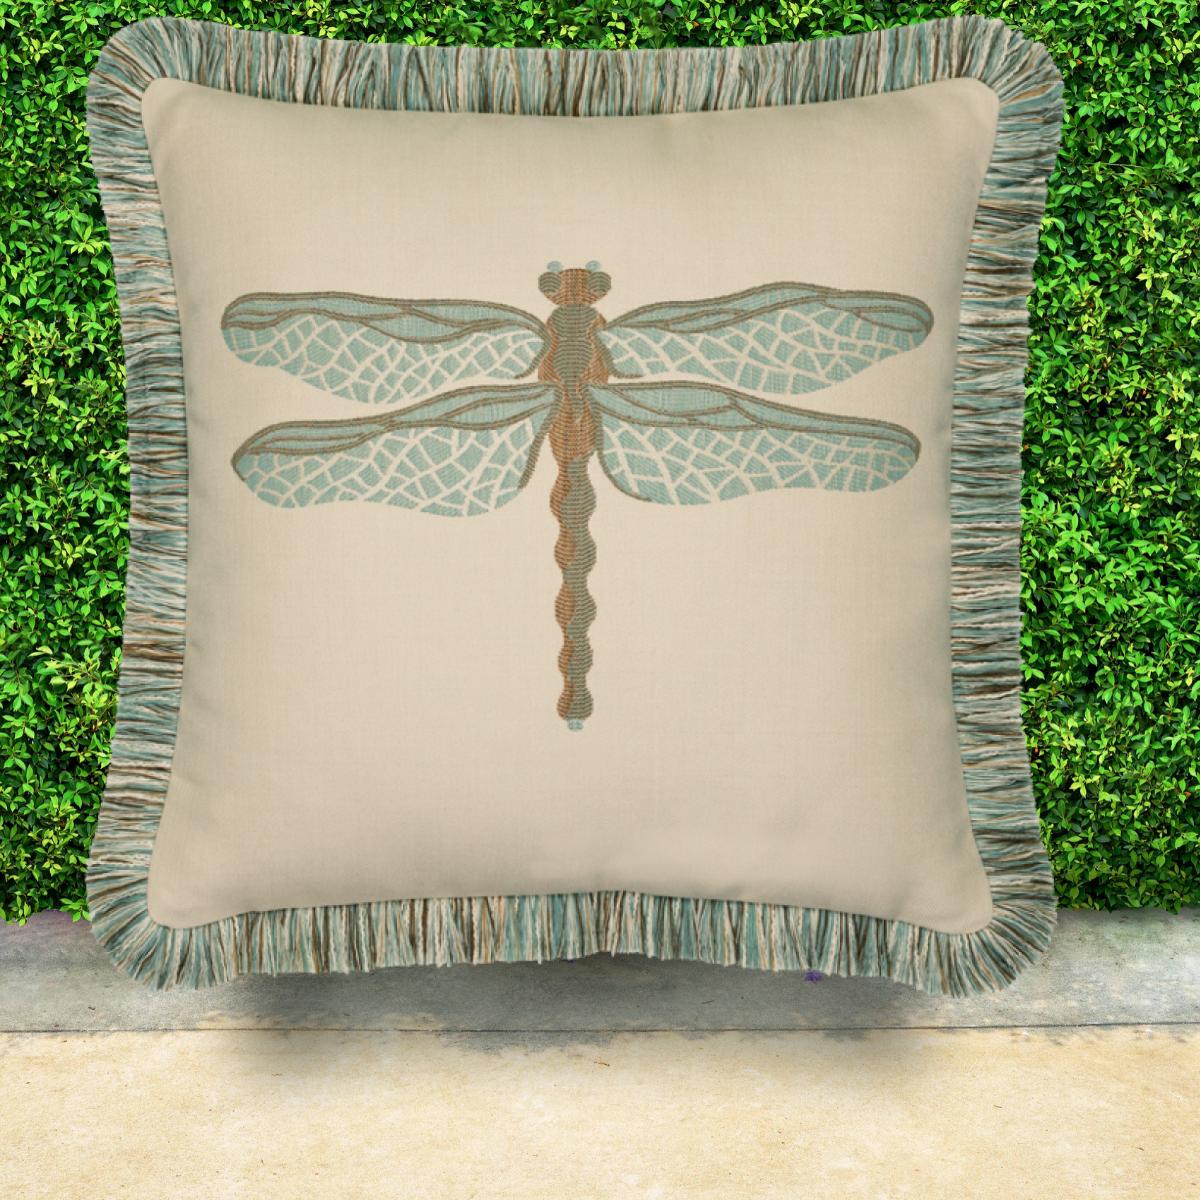 elaine-smith-sunbrella-dragonfly-pillow-spa